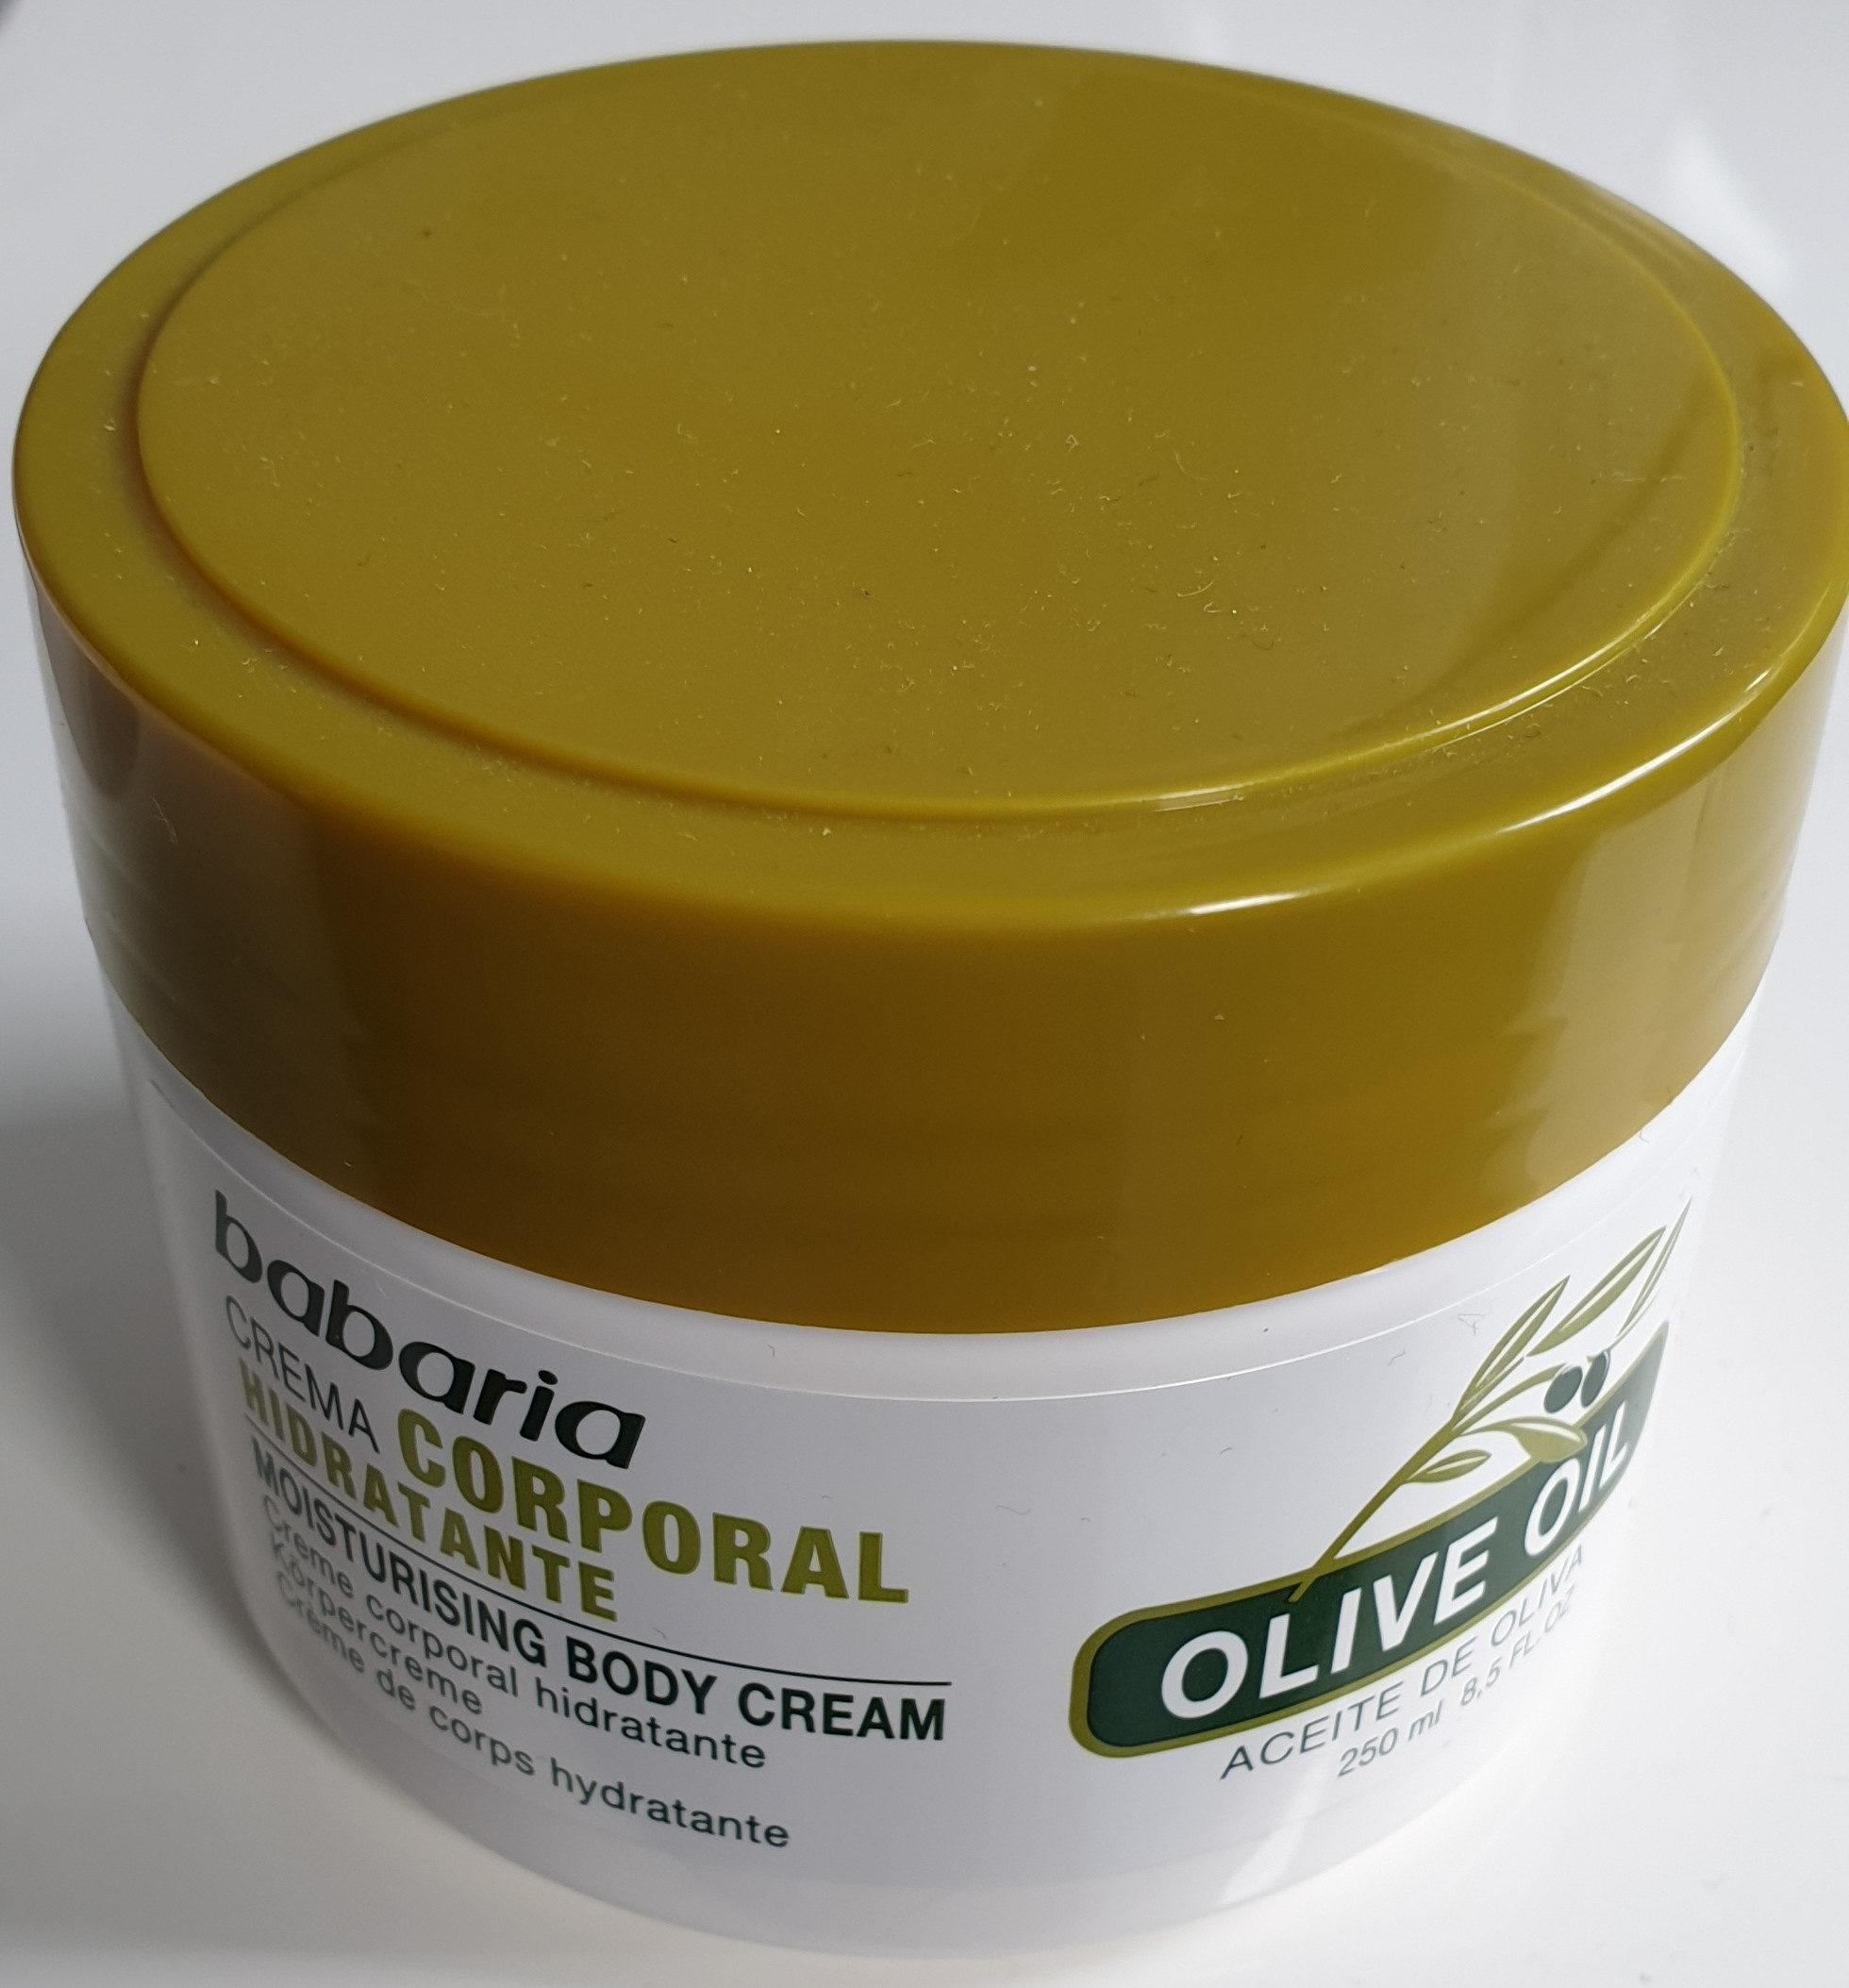 Olive oil moisturizing body cream - Product - de